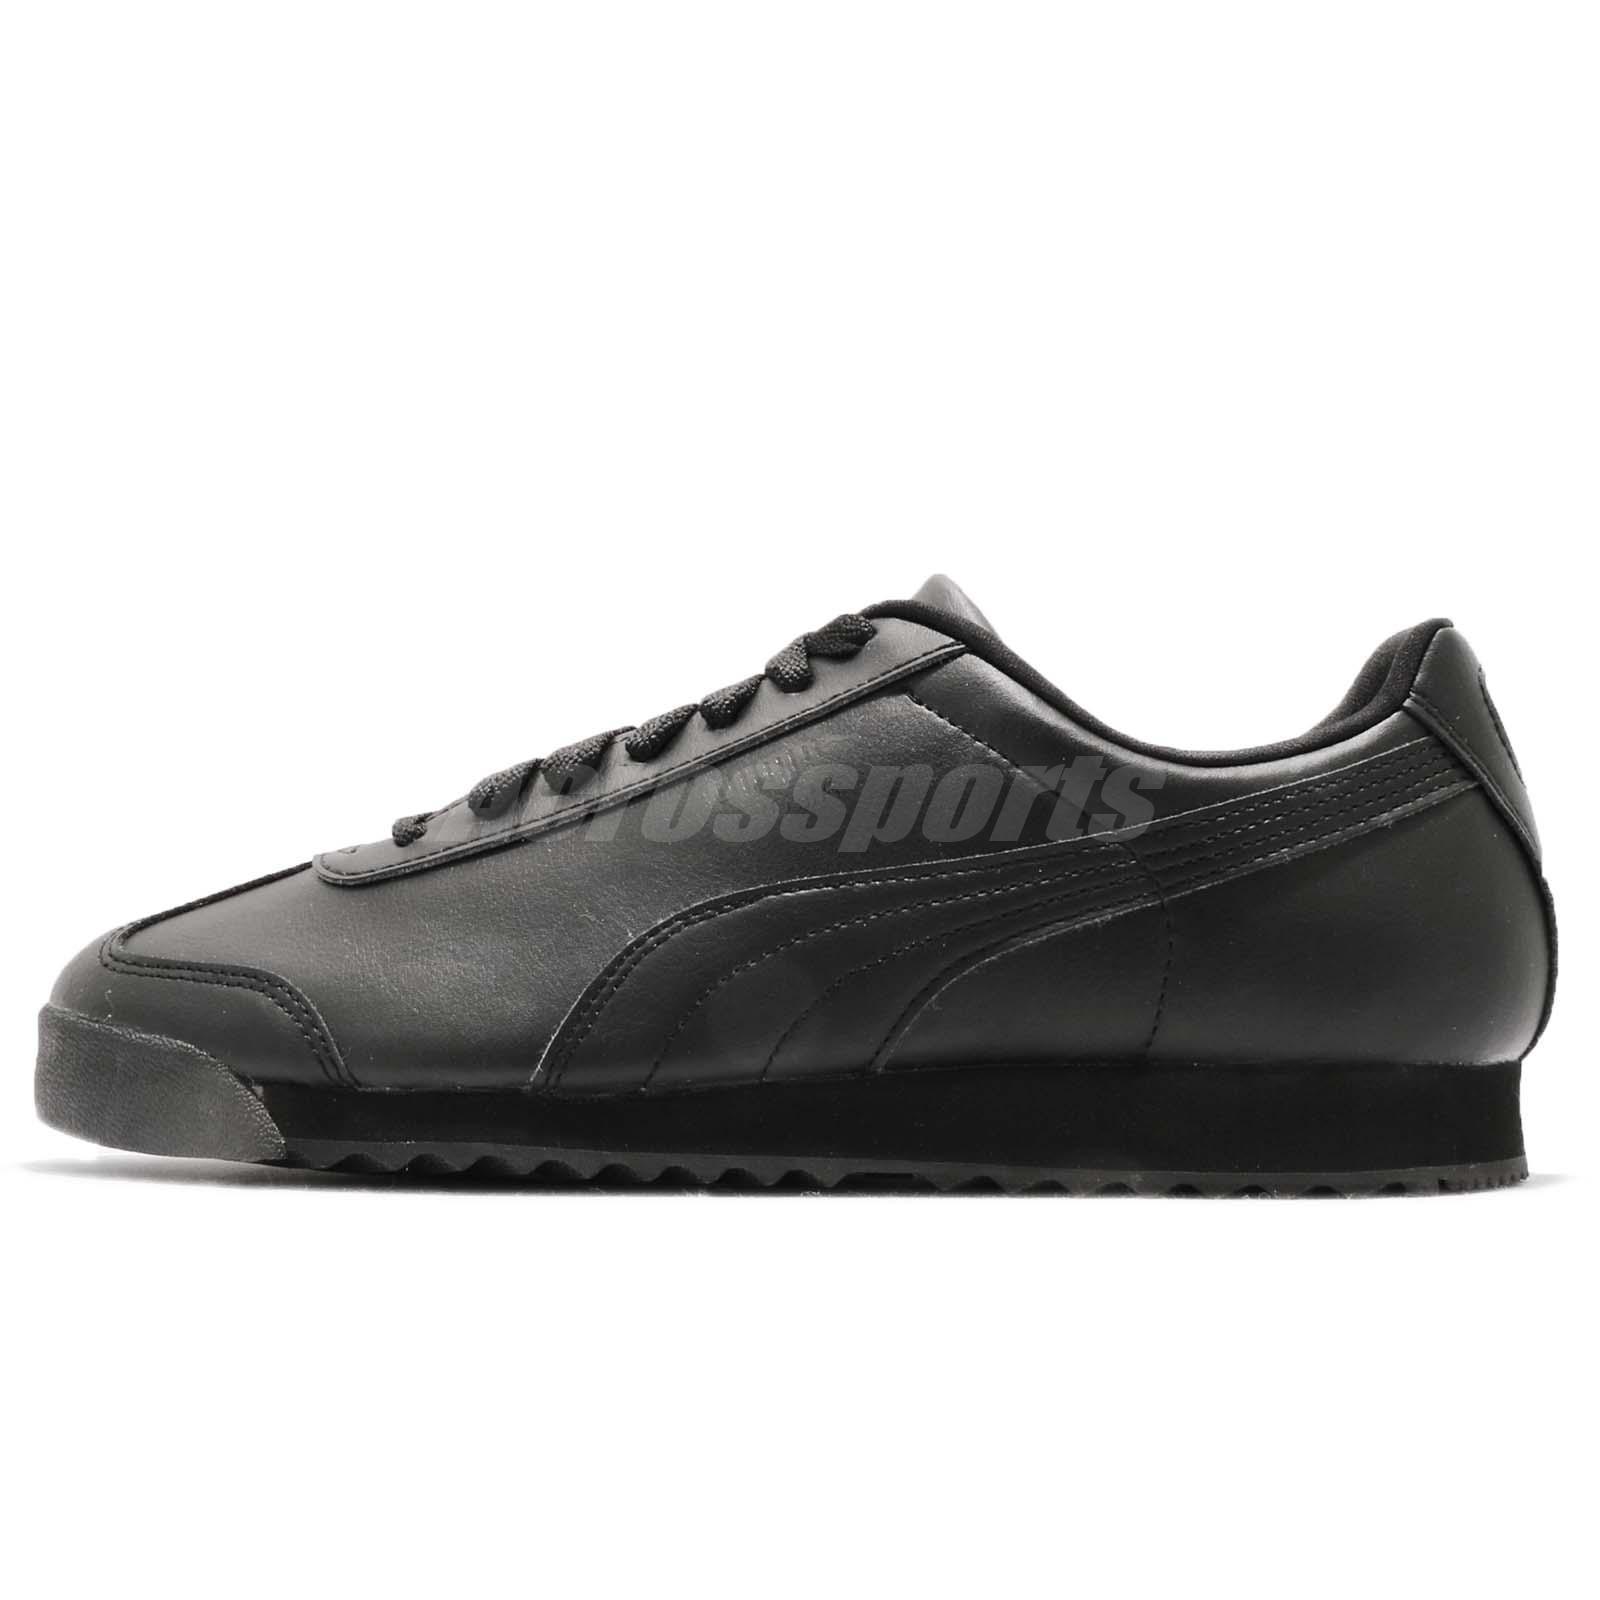 073e69333f64 Puma Roma Basic Triple Black Men Running Walking Casual Shoes Sneakers  353572-17